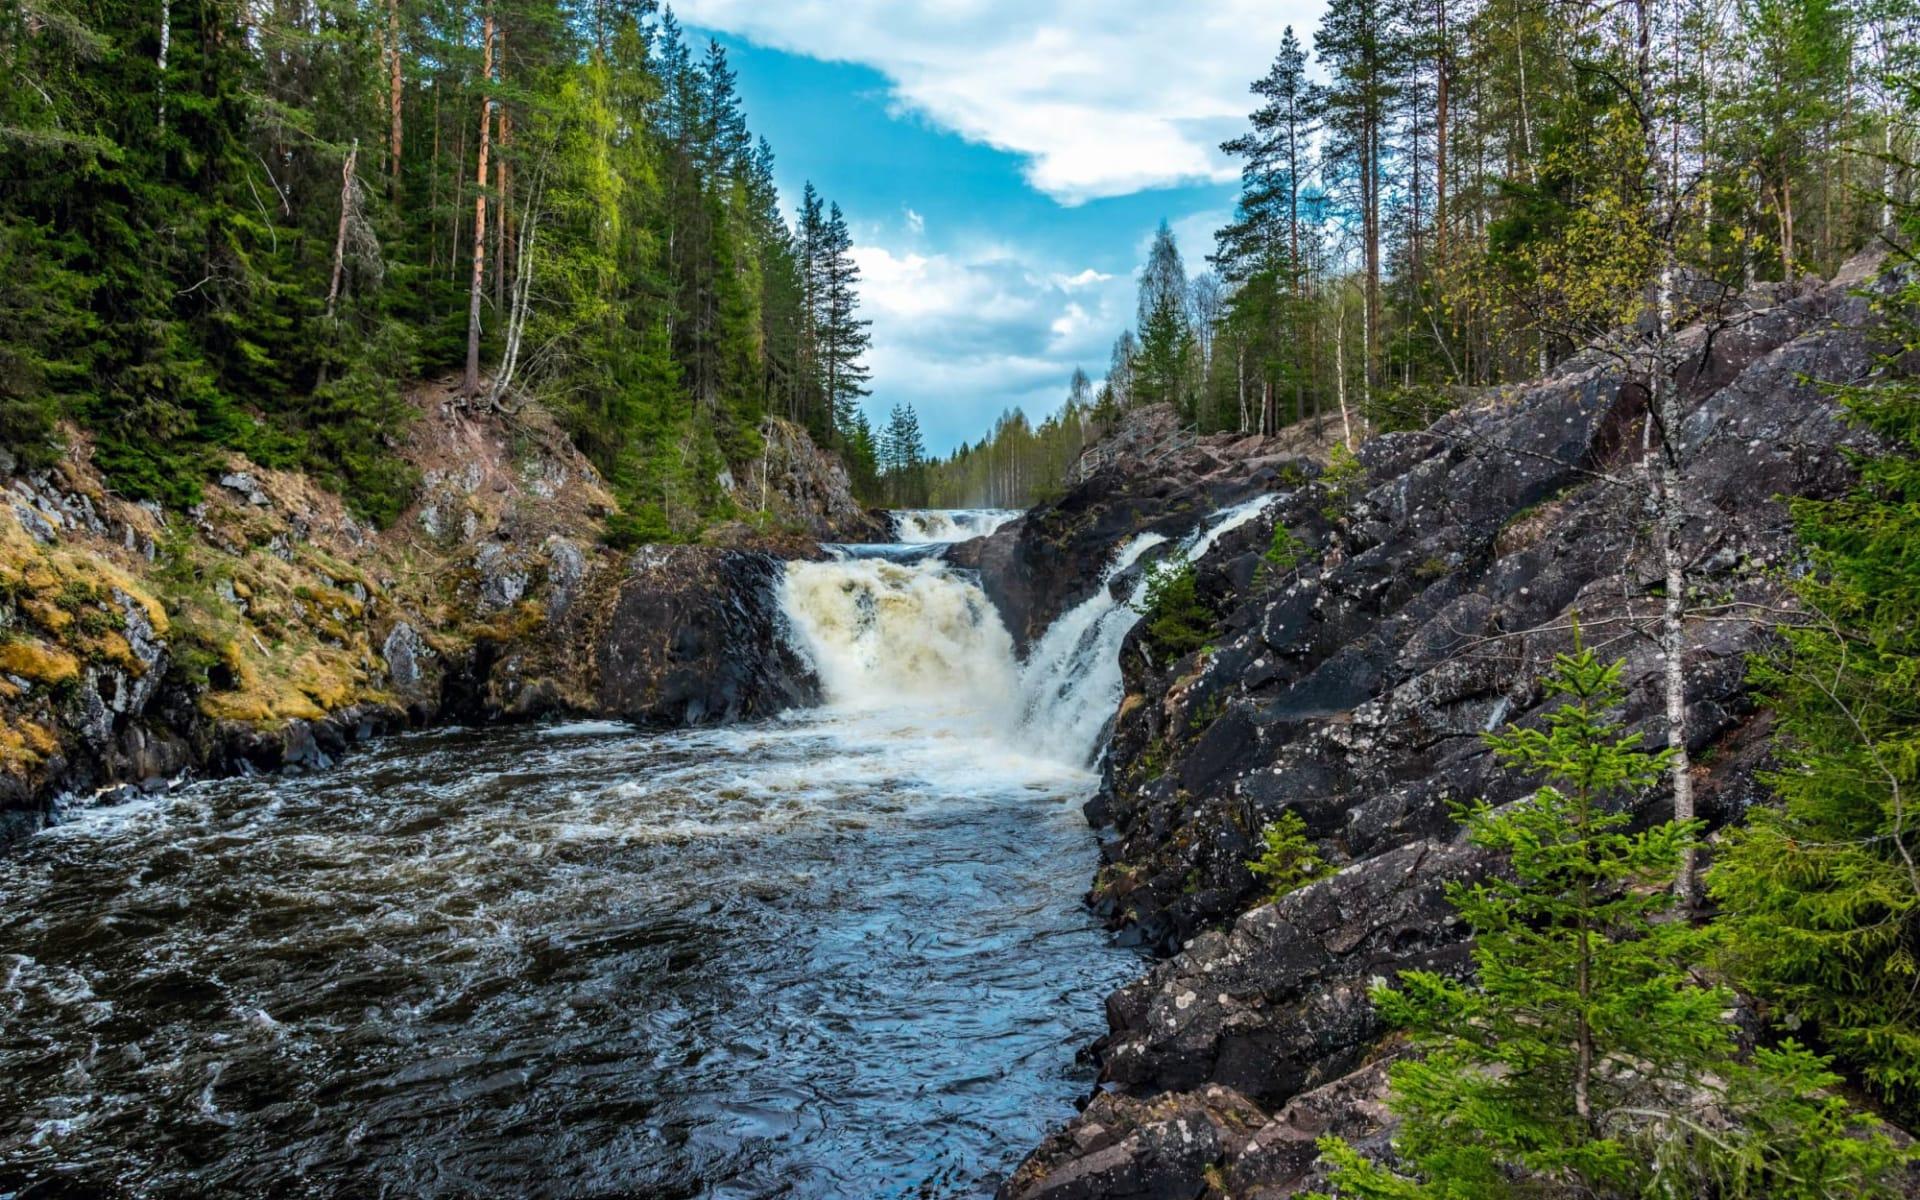 Abenteuer Karelien ab St. Petersburg: Russland_Kivach_Wasserfall_